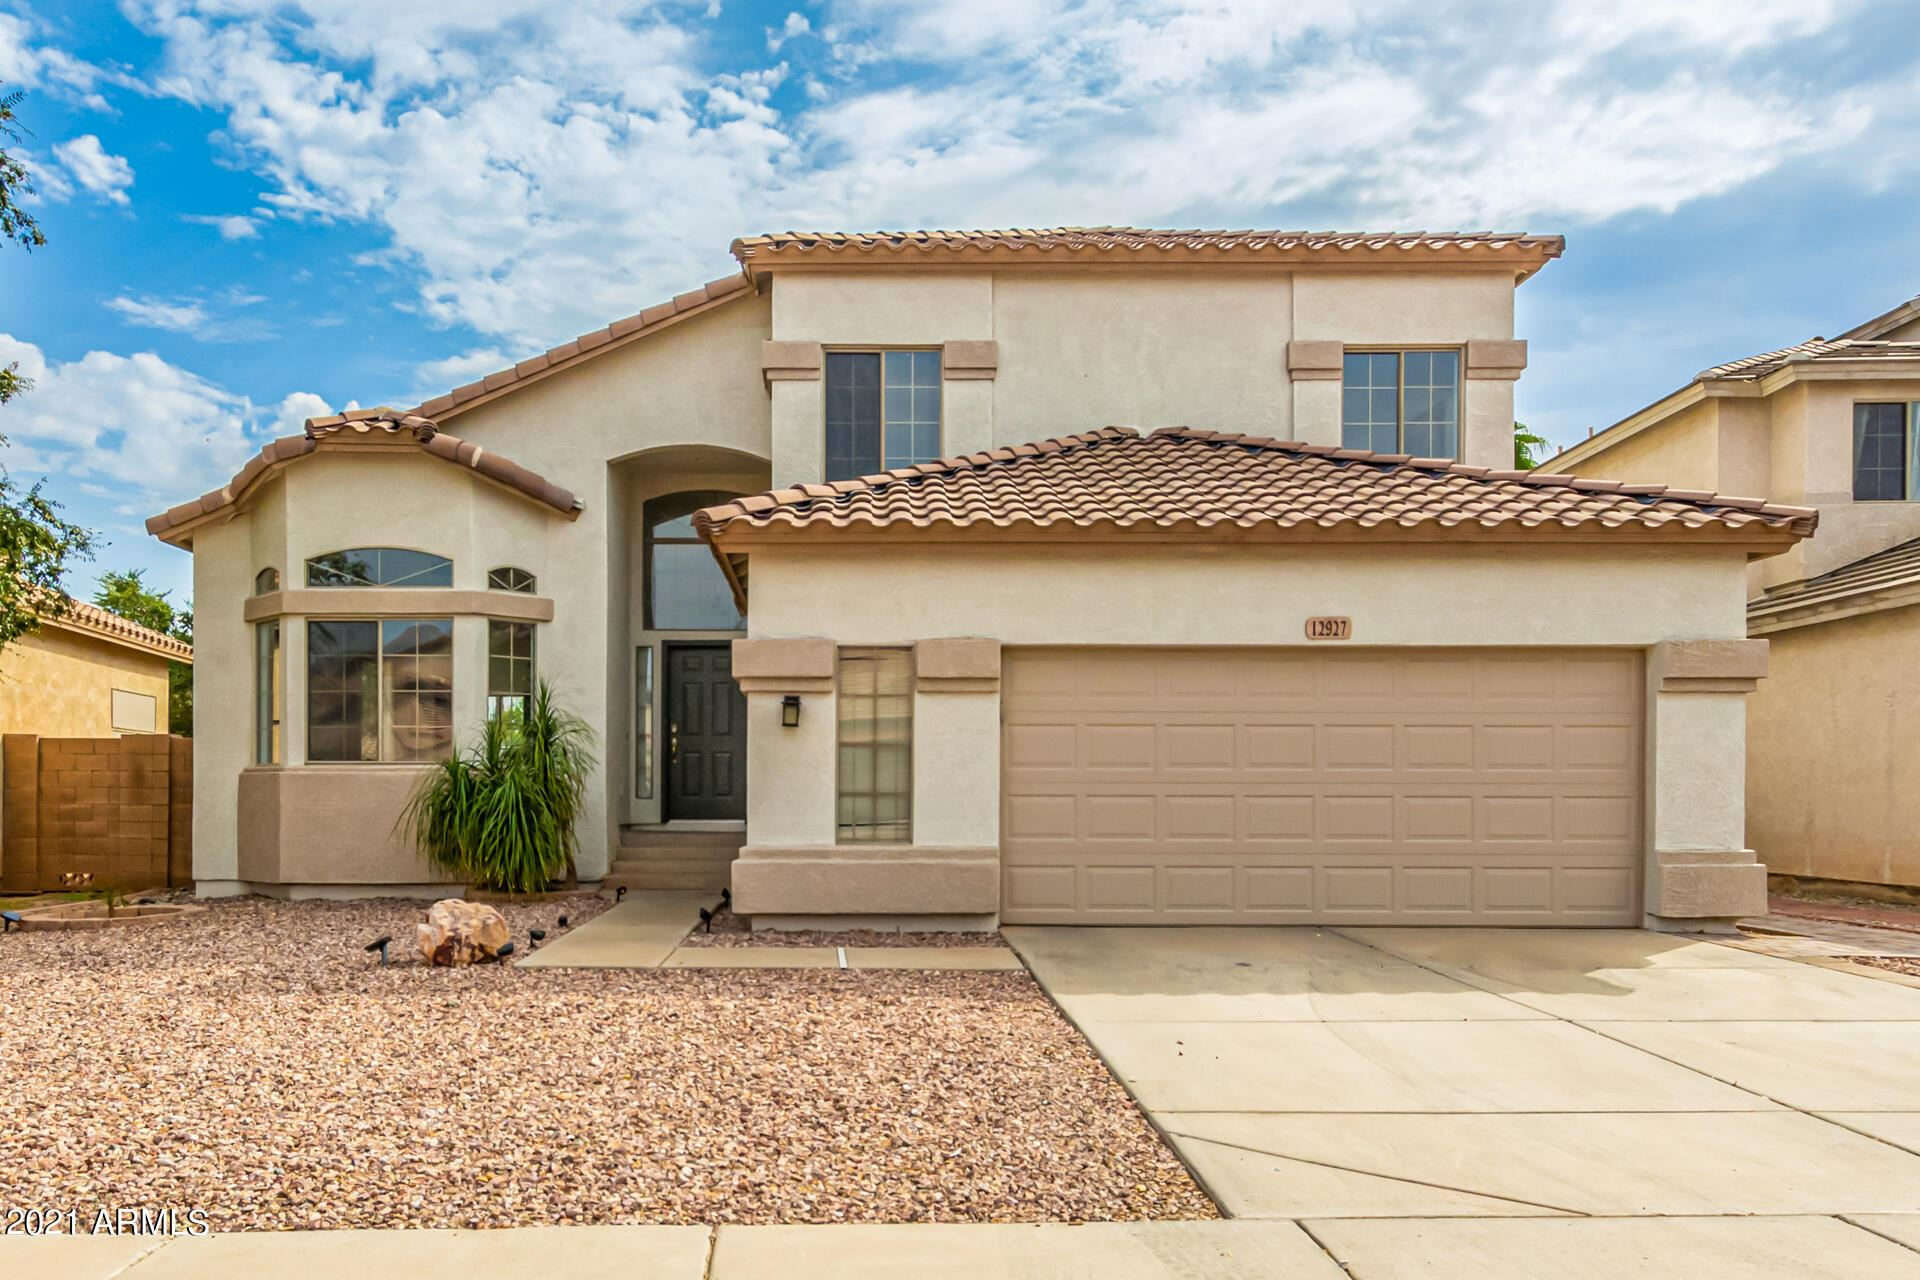 Photo of 12927 W SOLEDAD Street, El Mirage, AZ 85335 (MLS # 6294879)